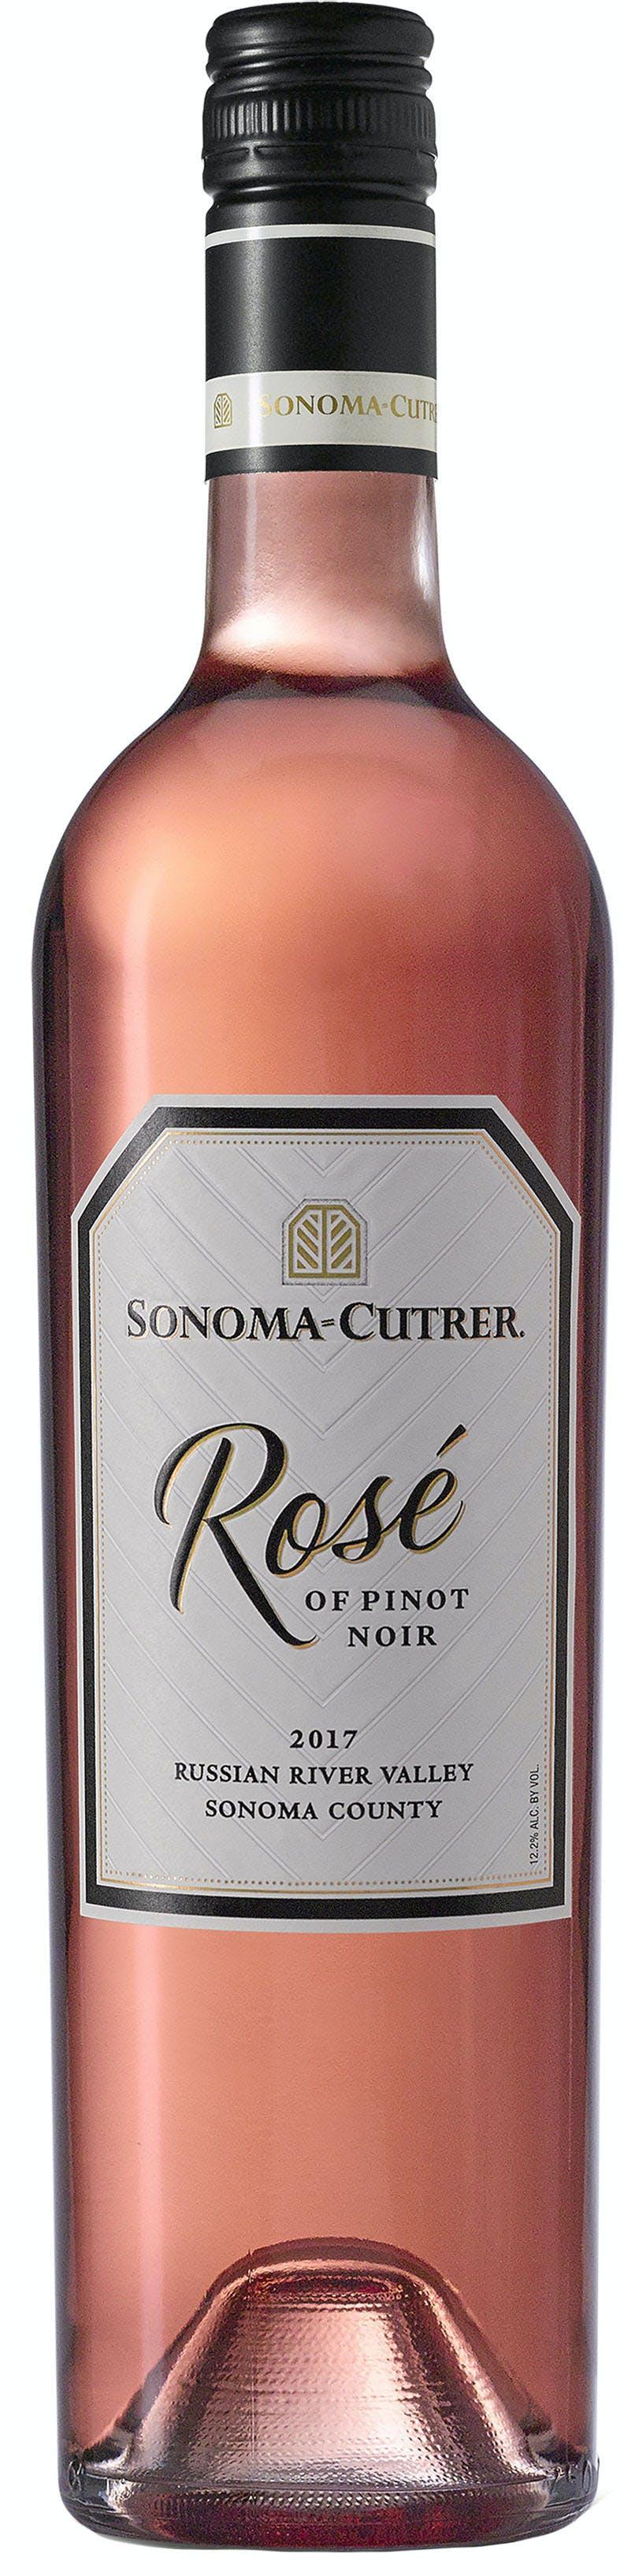 Sonoma Cutrer Rose of Pinot Noir 2017